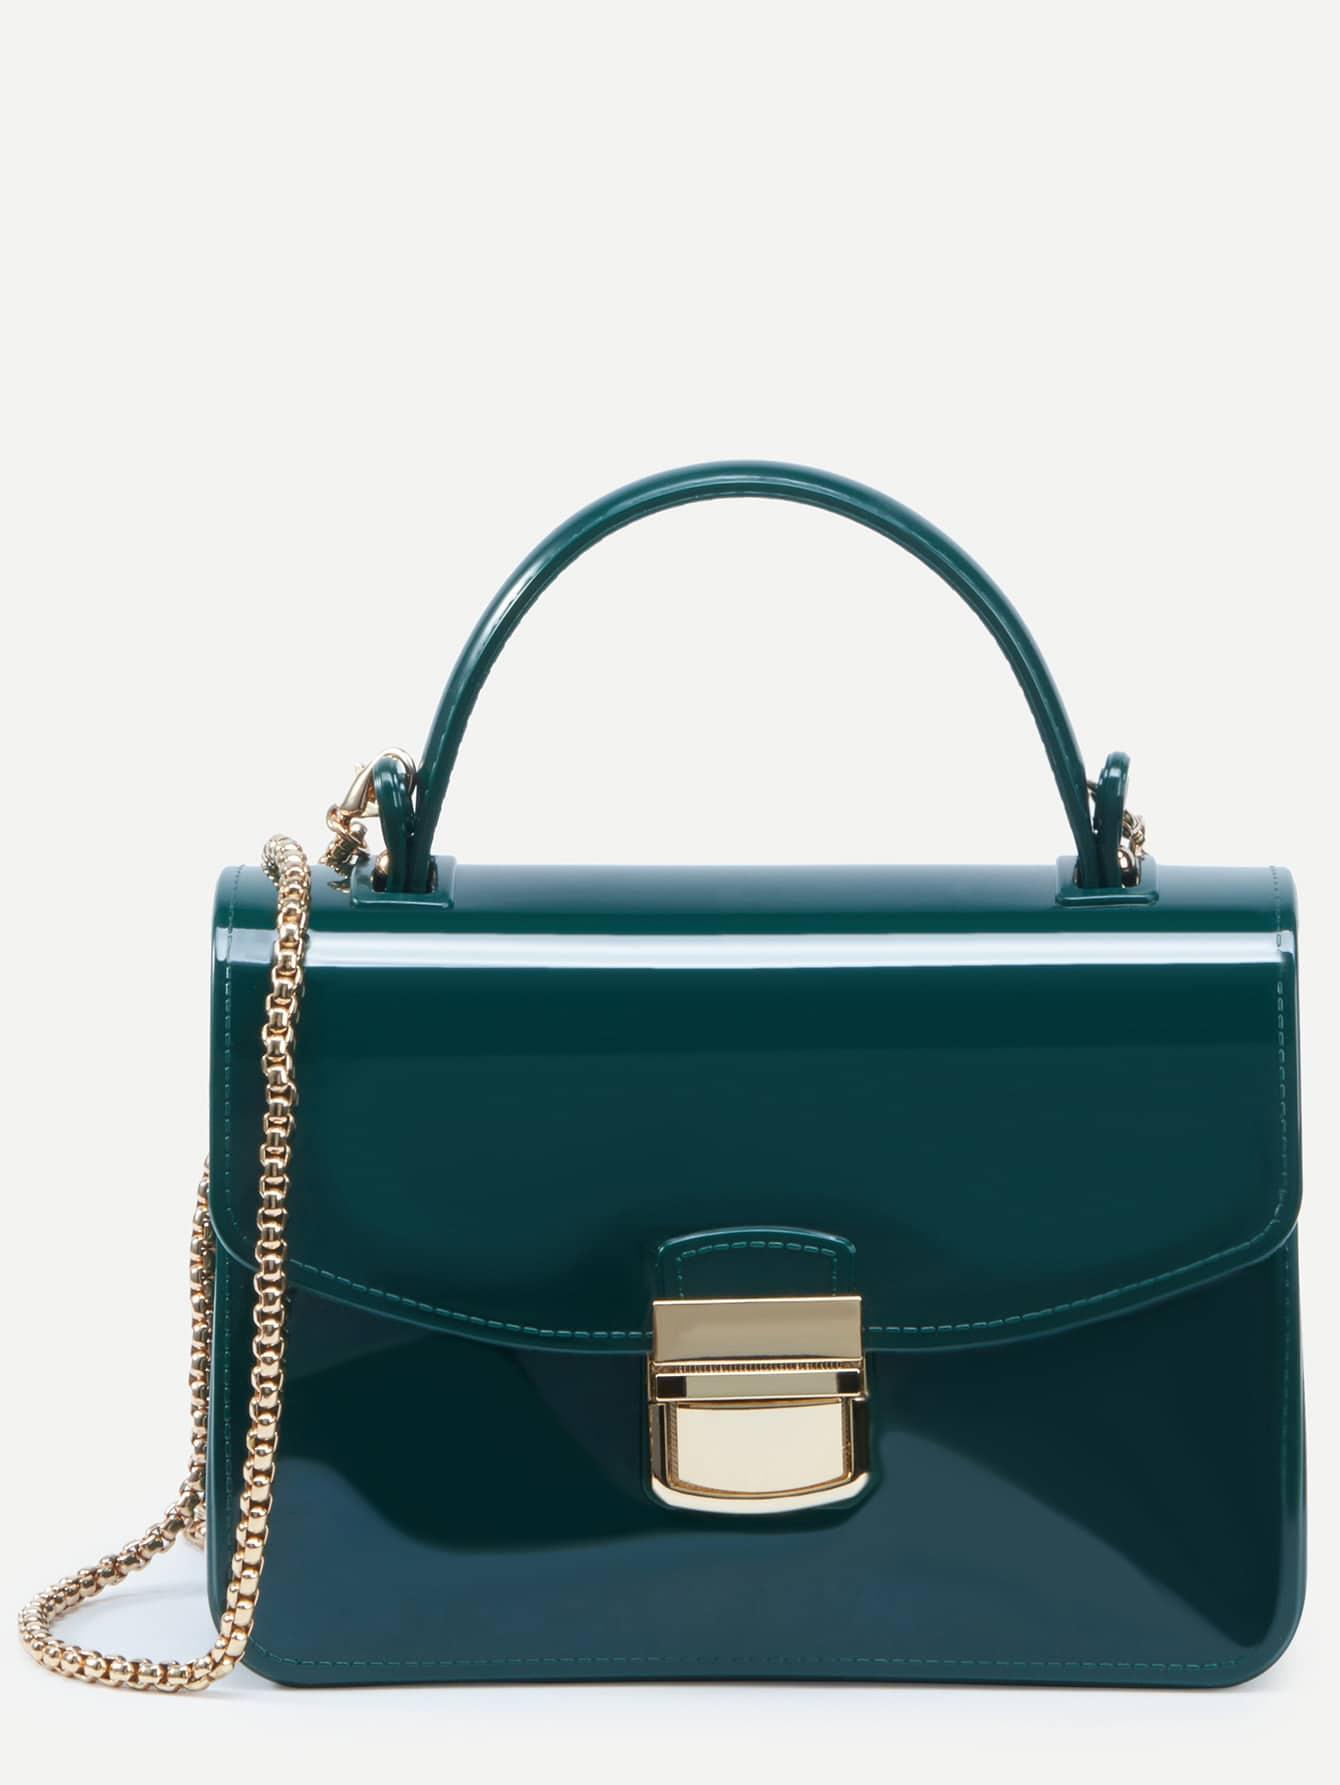 Green Pushlock Closure Plastic Handbag With Chain все цены